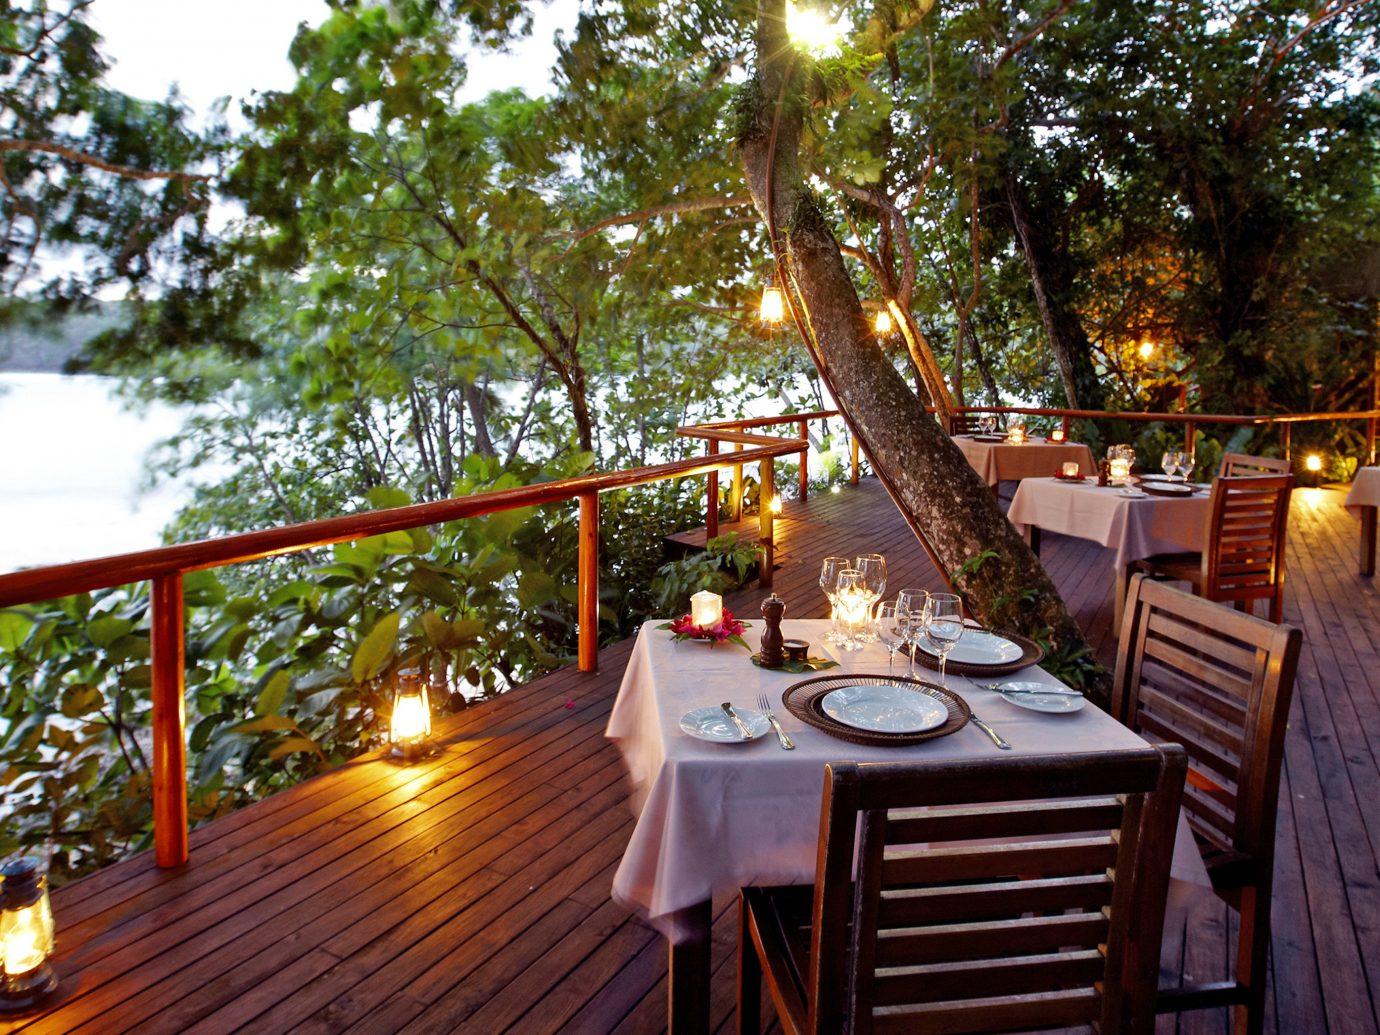 All-Inclusive Resorts Dining Drink Eat Hotels Luxury Travel Scenic views Waterfront tree outdoor Resort estate restaurant waterway wood furniture